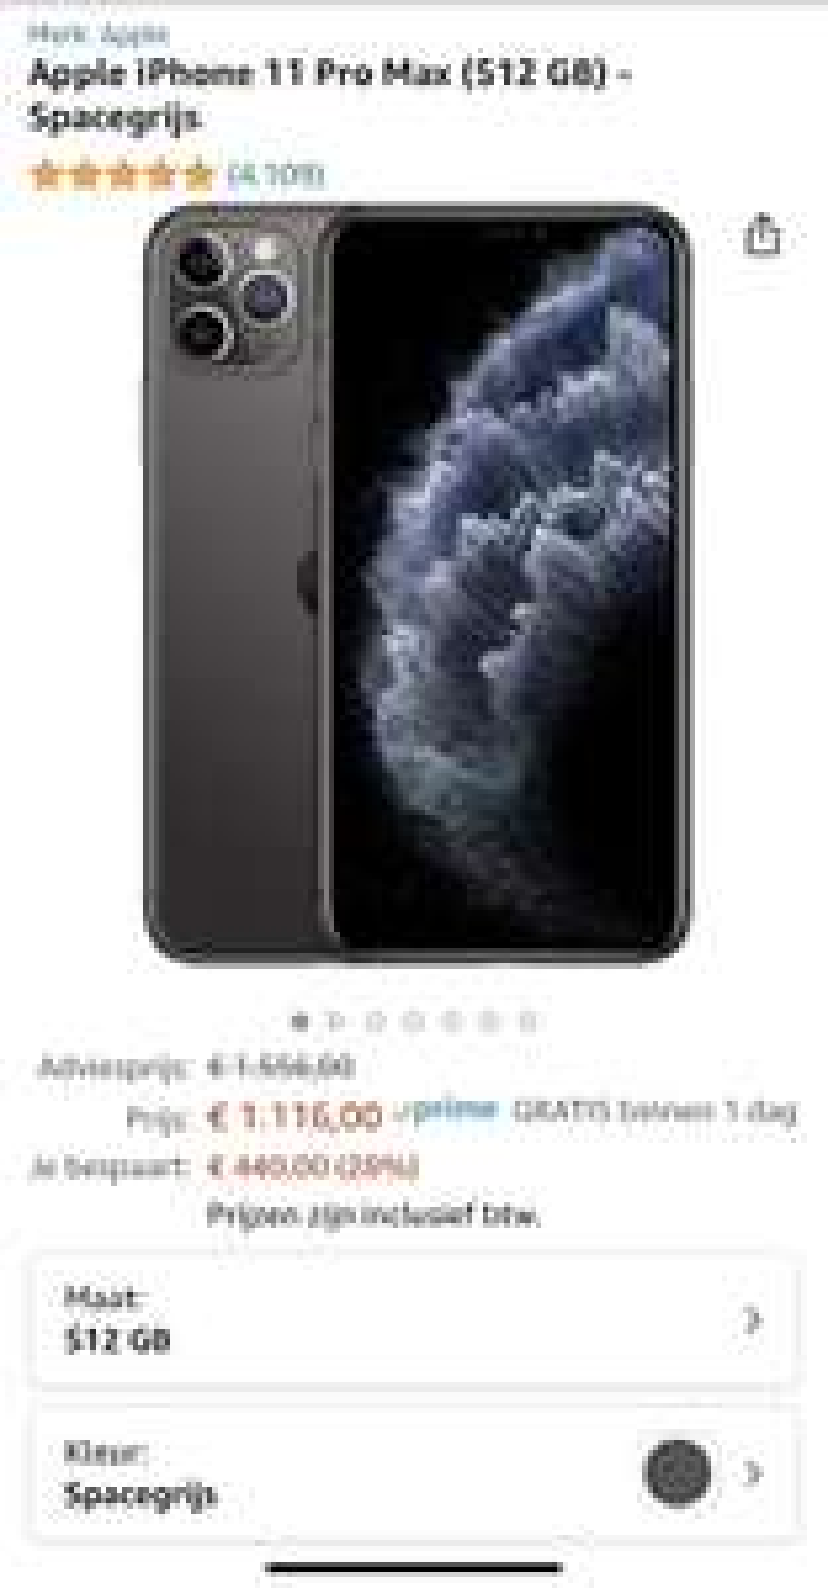 iPhone 11 Pro Max 512 gb amazon.nl